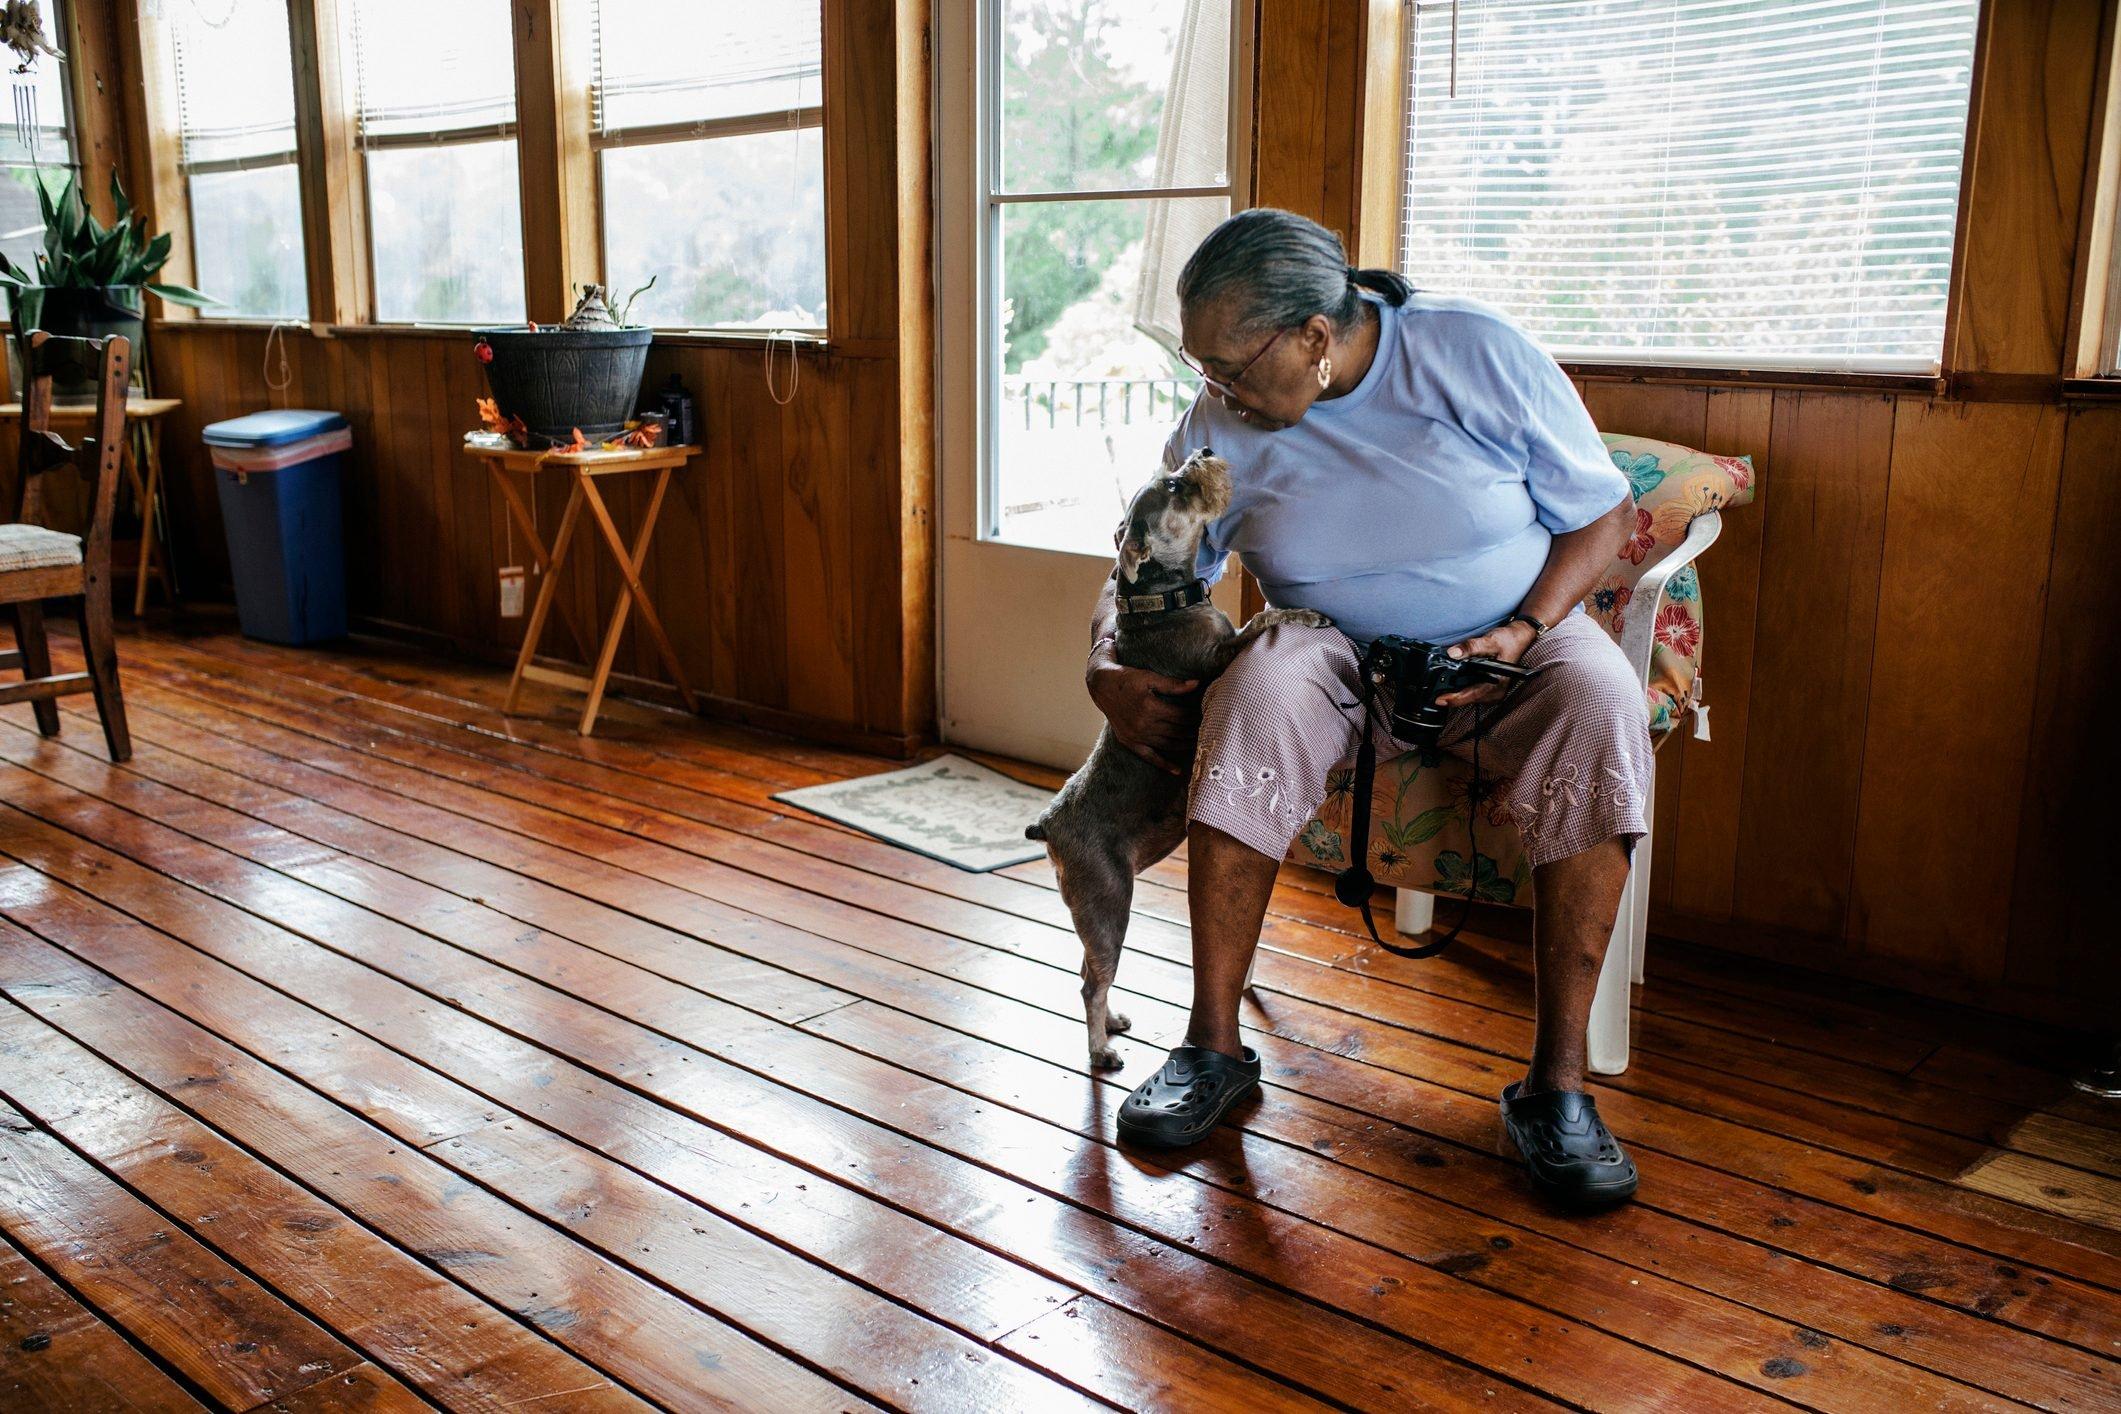 Senior black woman patting the family dog